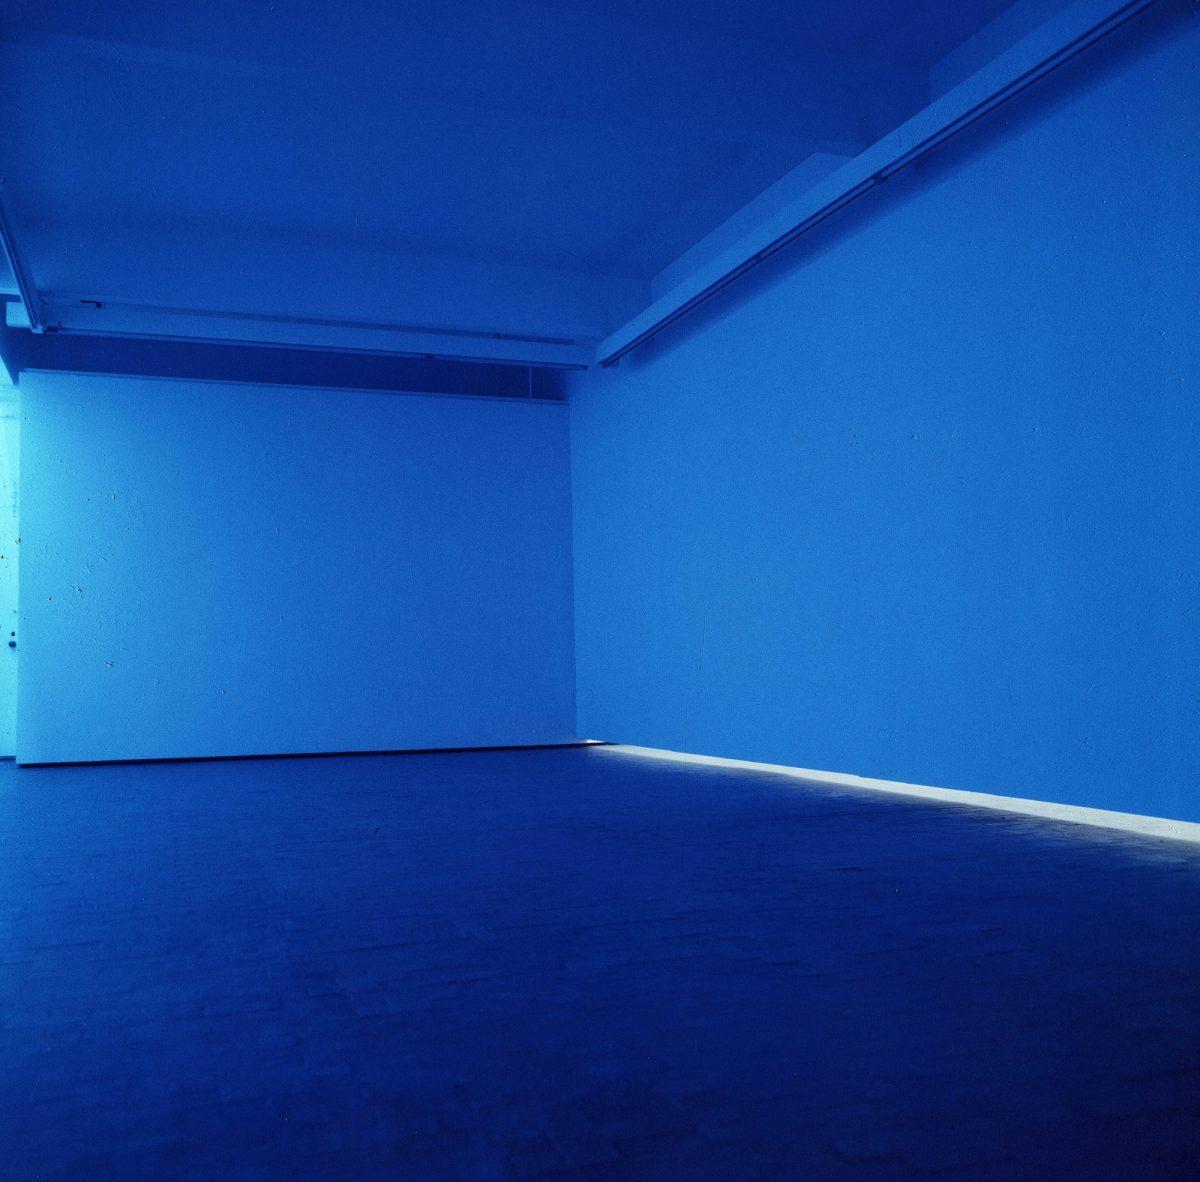 exhibitions blain southern. Black Bedroom Furniture Sets. Home Design Ideas